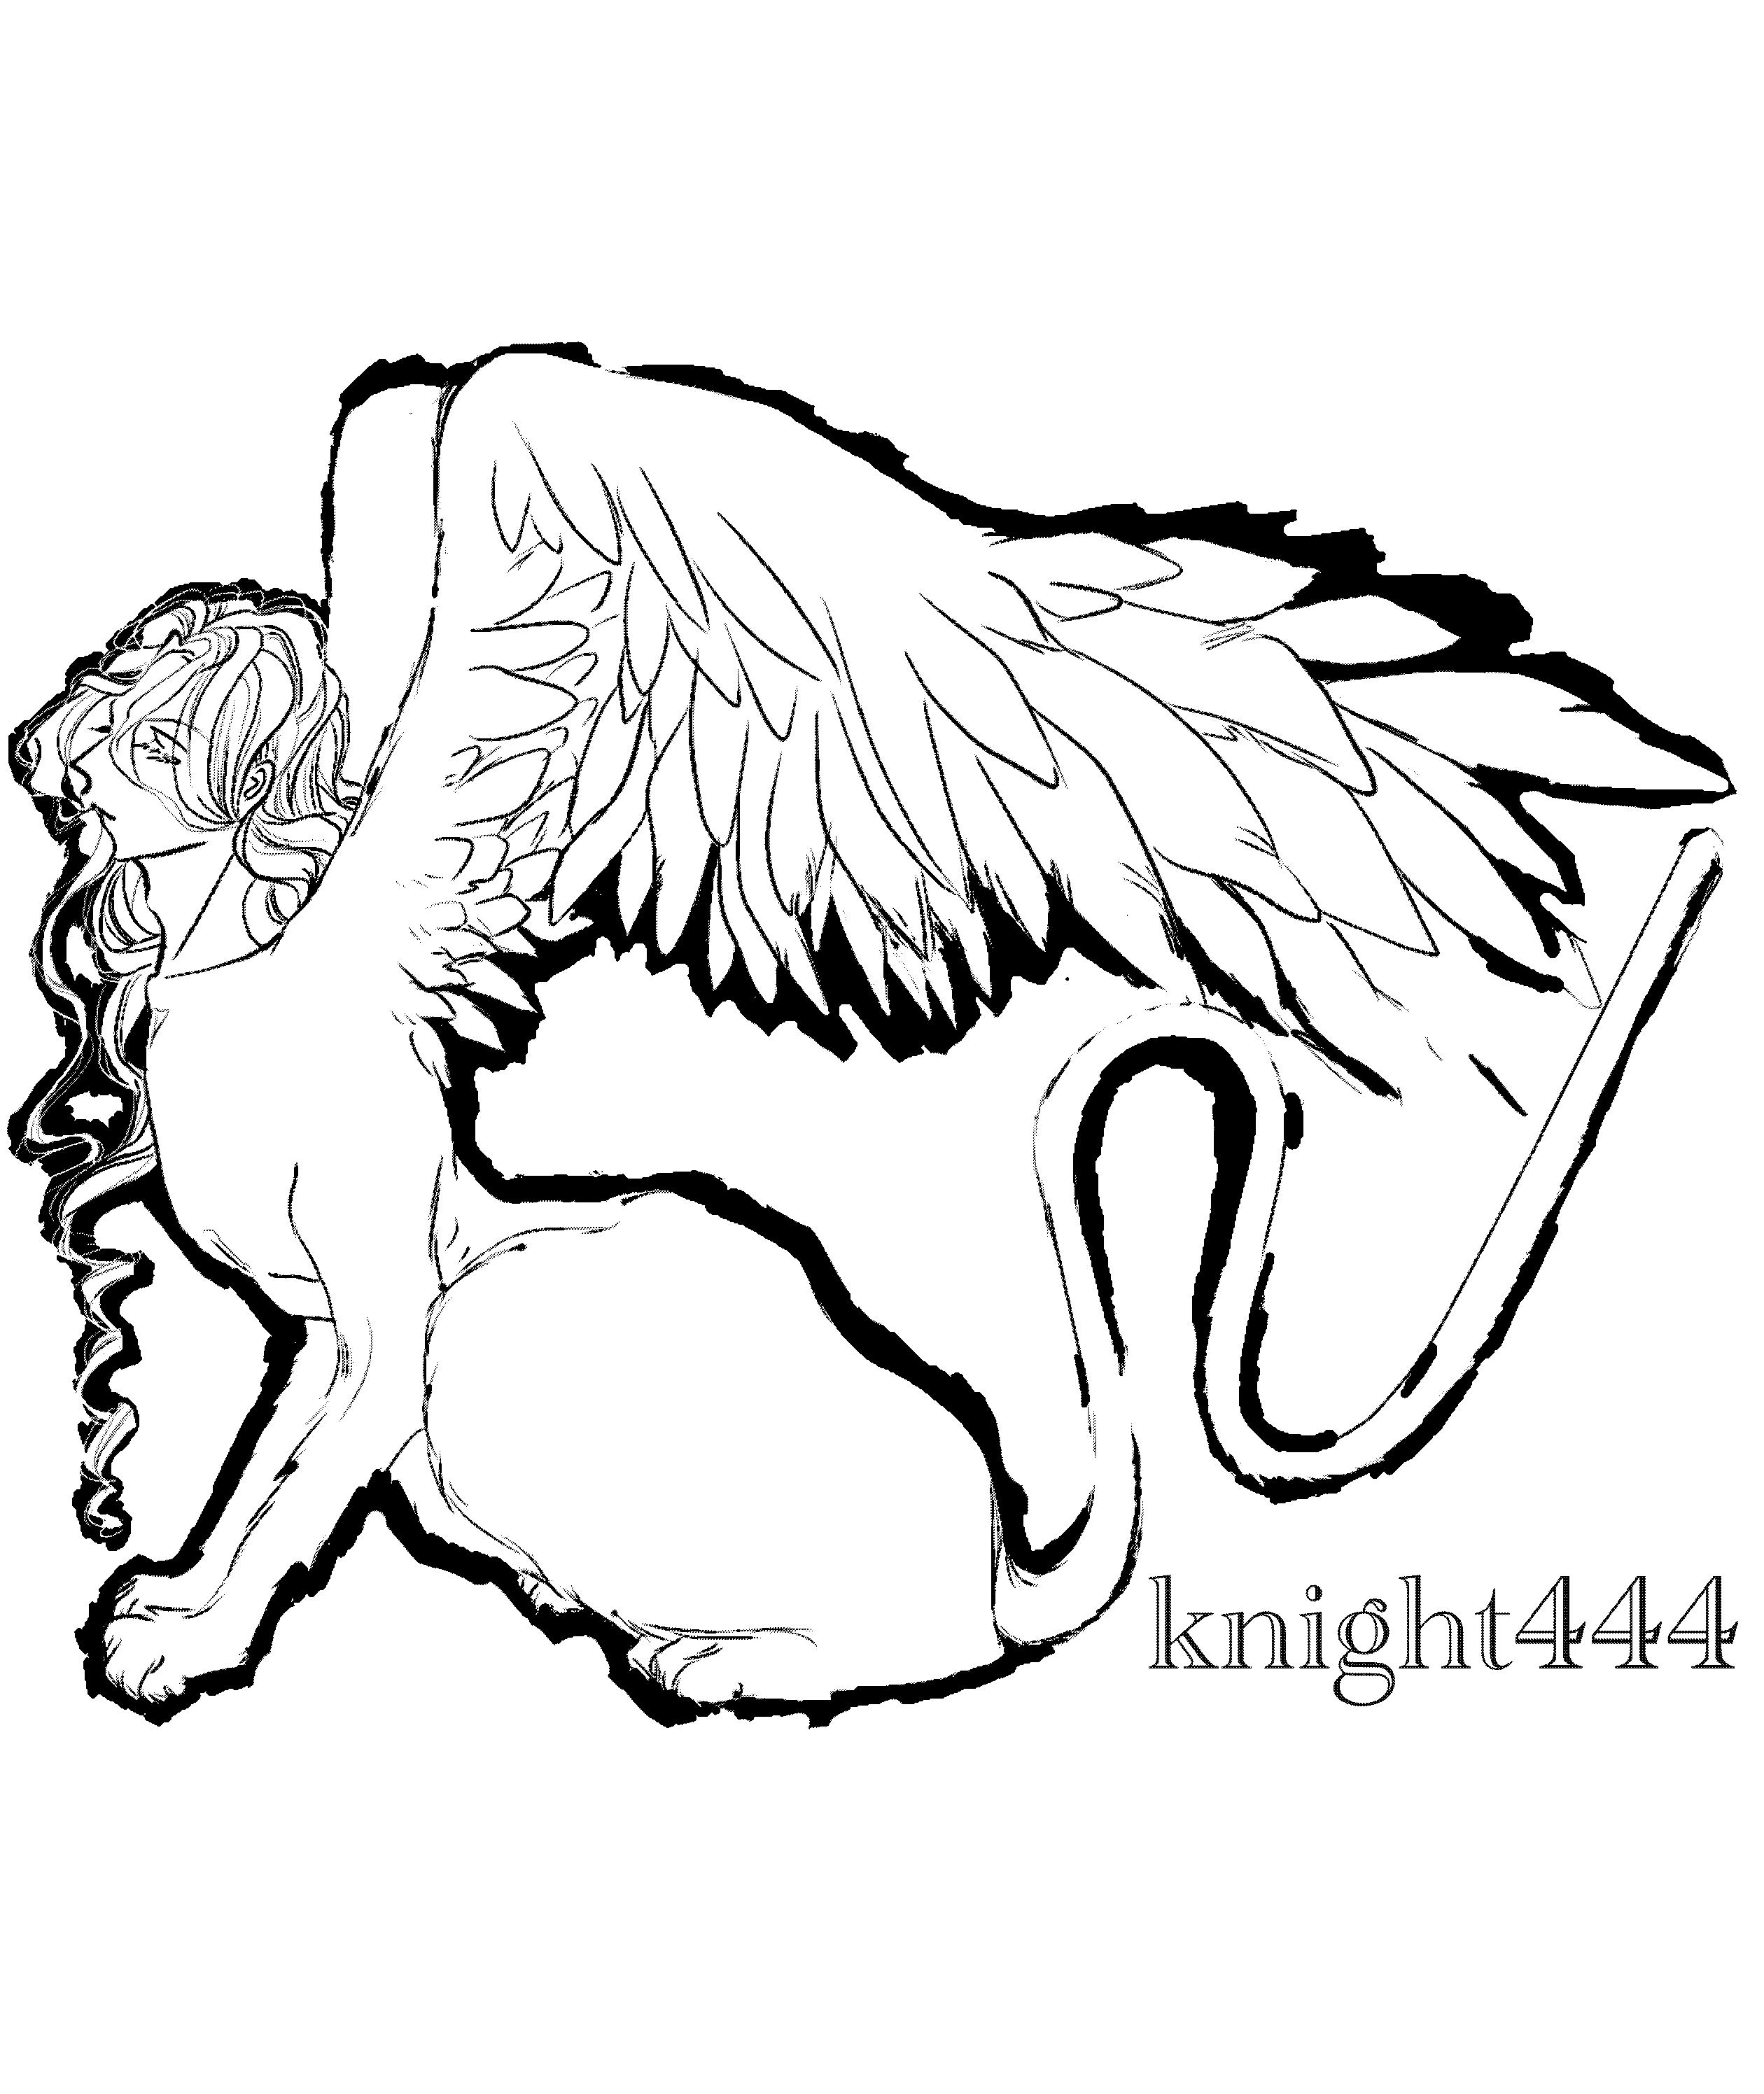 knight444